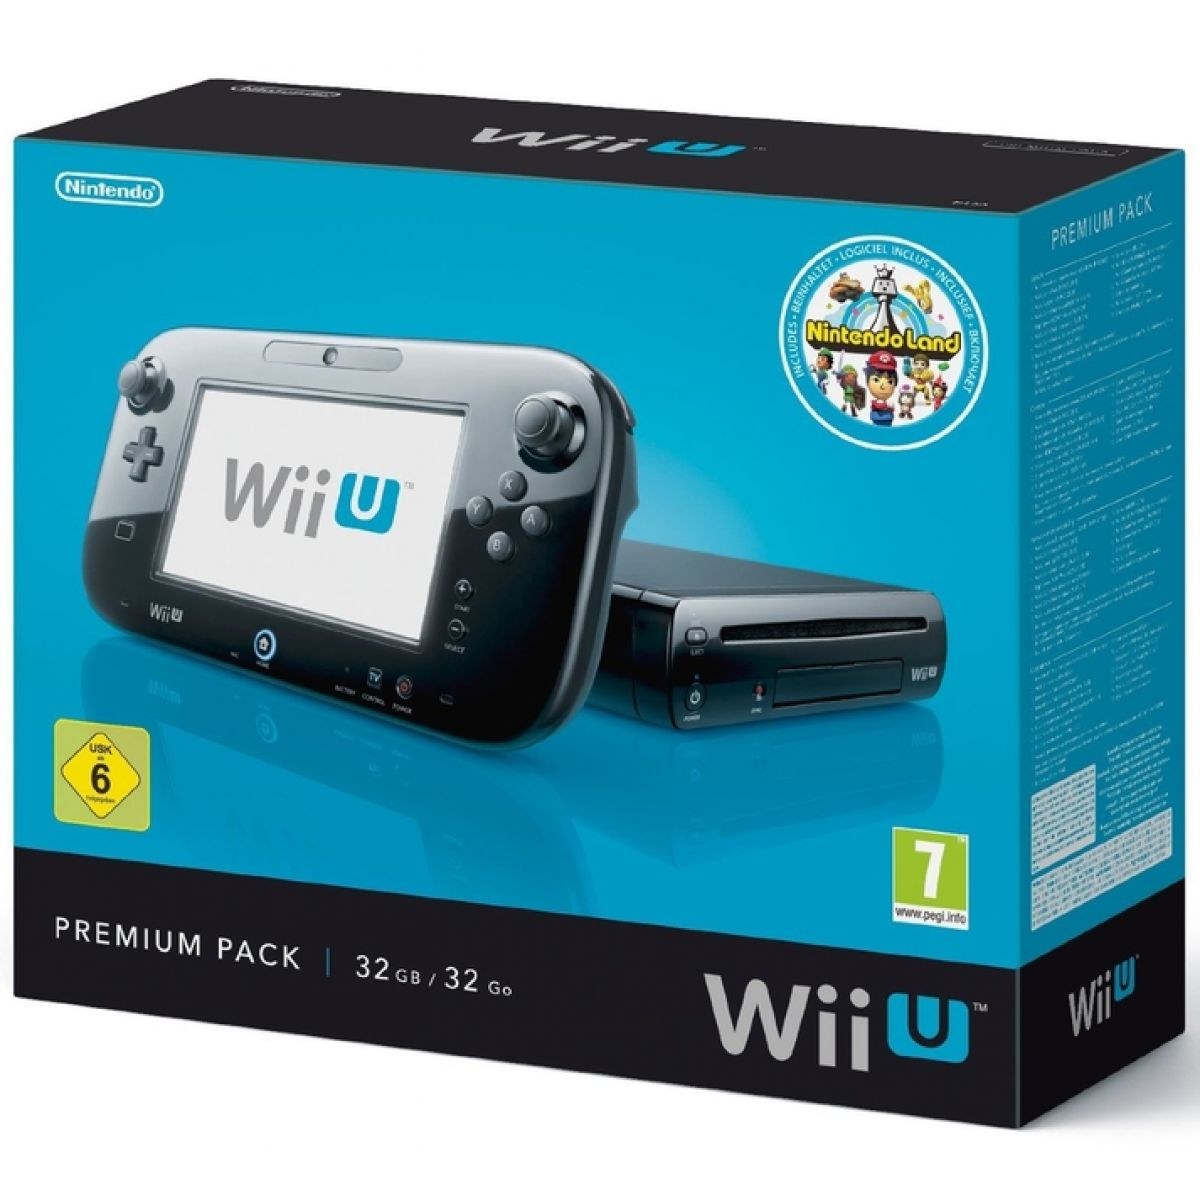 Nintendo Wii U Black Premium Pack 32GB + Nintendo Land